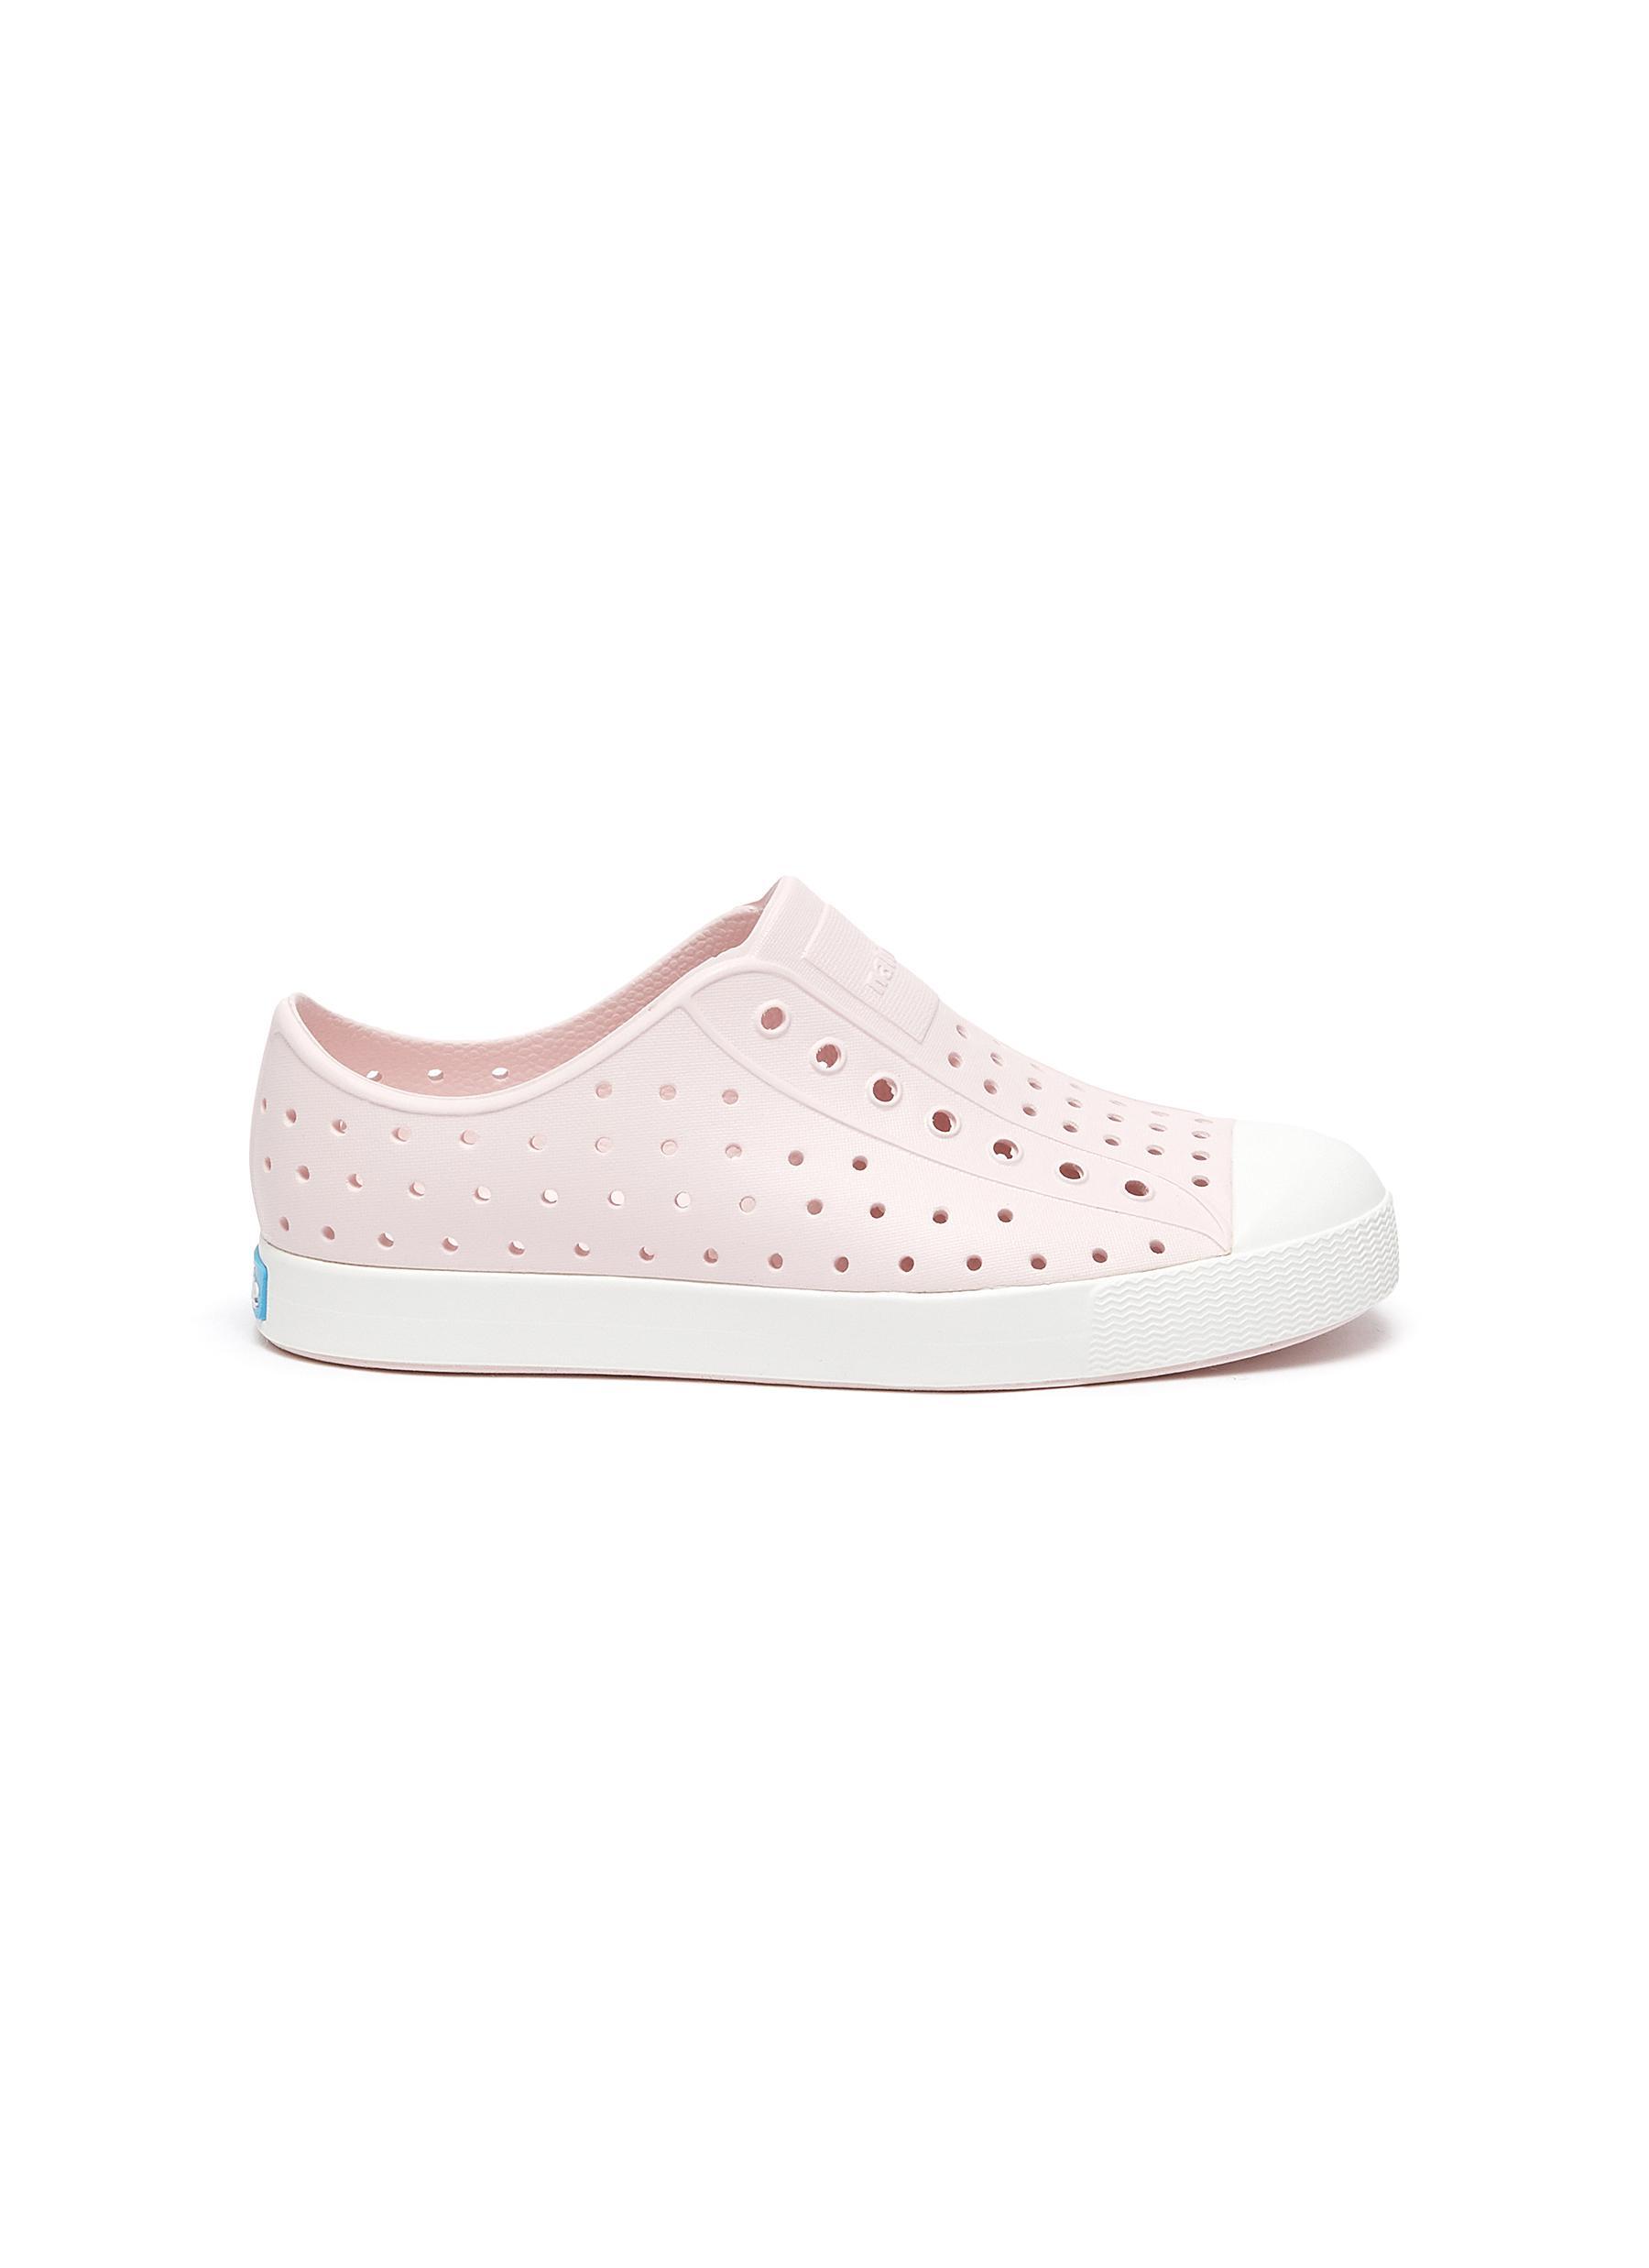 Jefferson' Perforated Colourblock Junior Slip-on Sneakers - NATIVE - Modalova